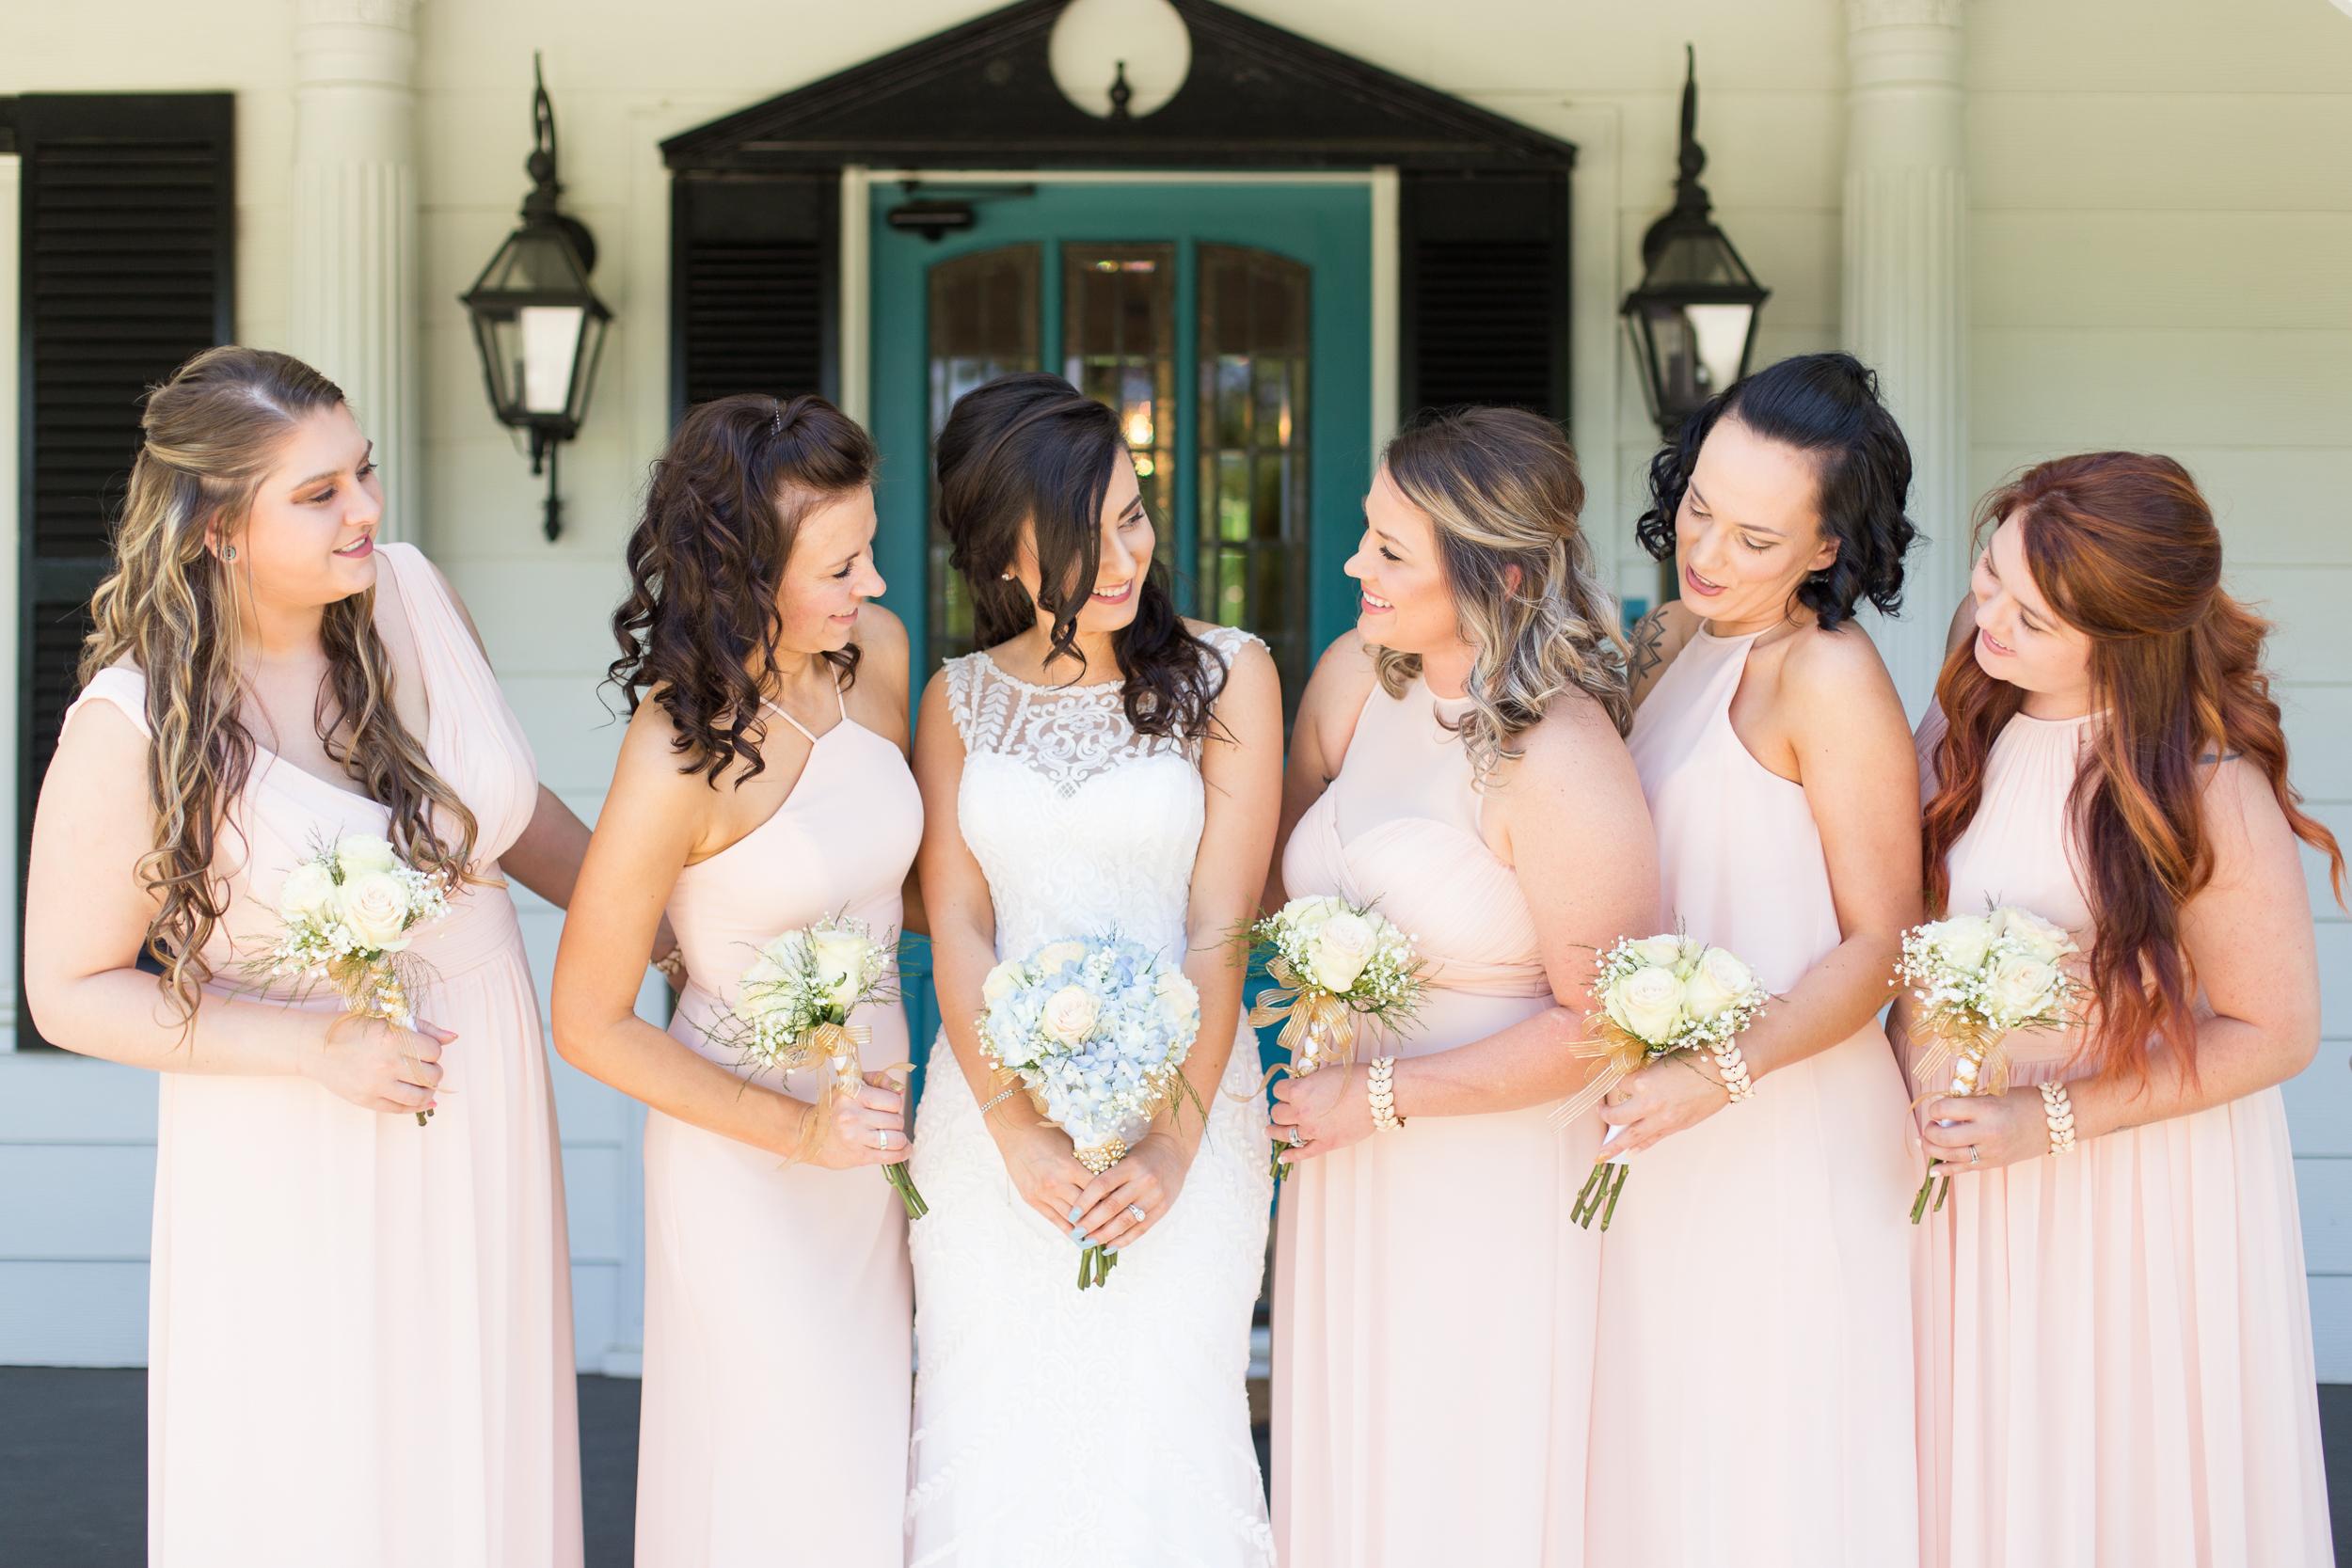 Zihlman-East TX Wedding_Kelsie Hendricks Photography_The Folmar Tyler Texas-63.jpg